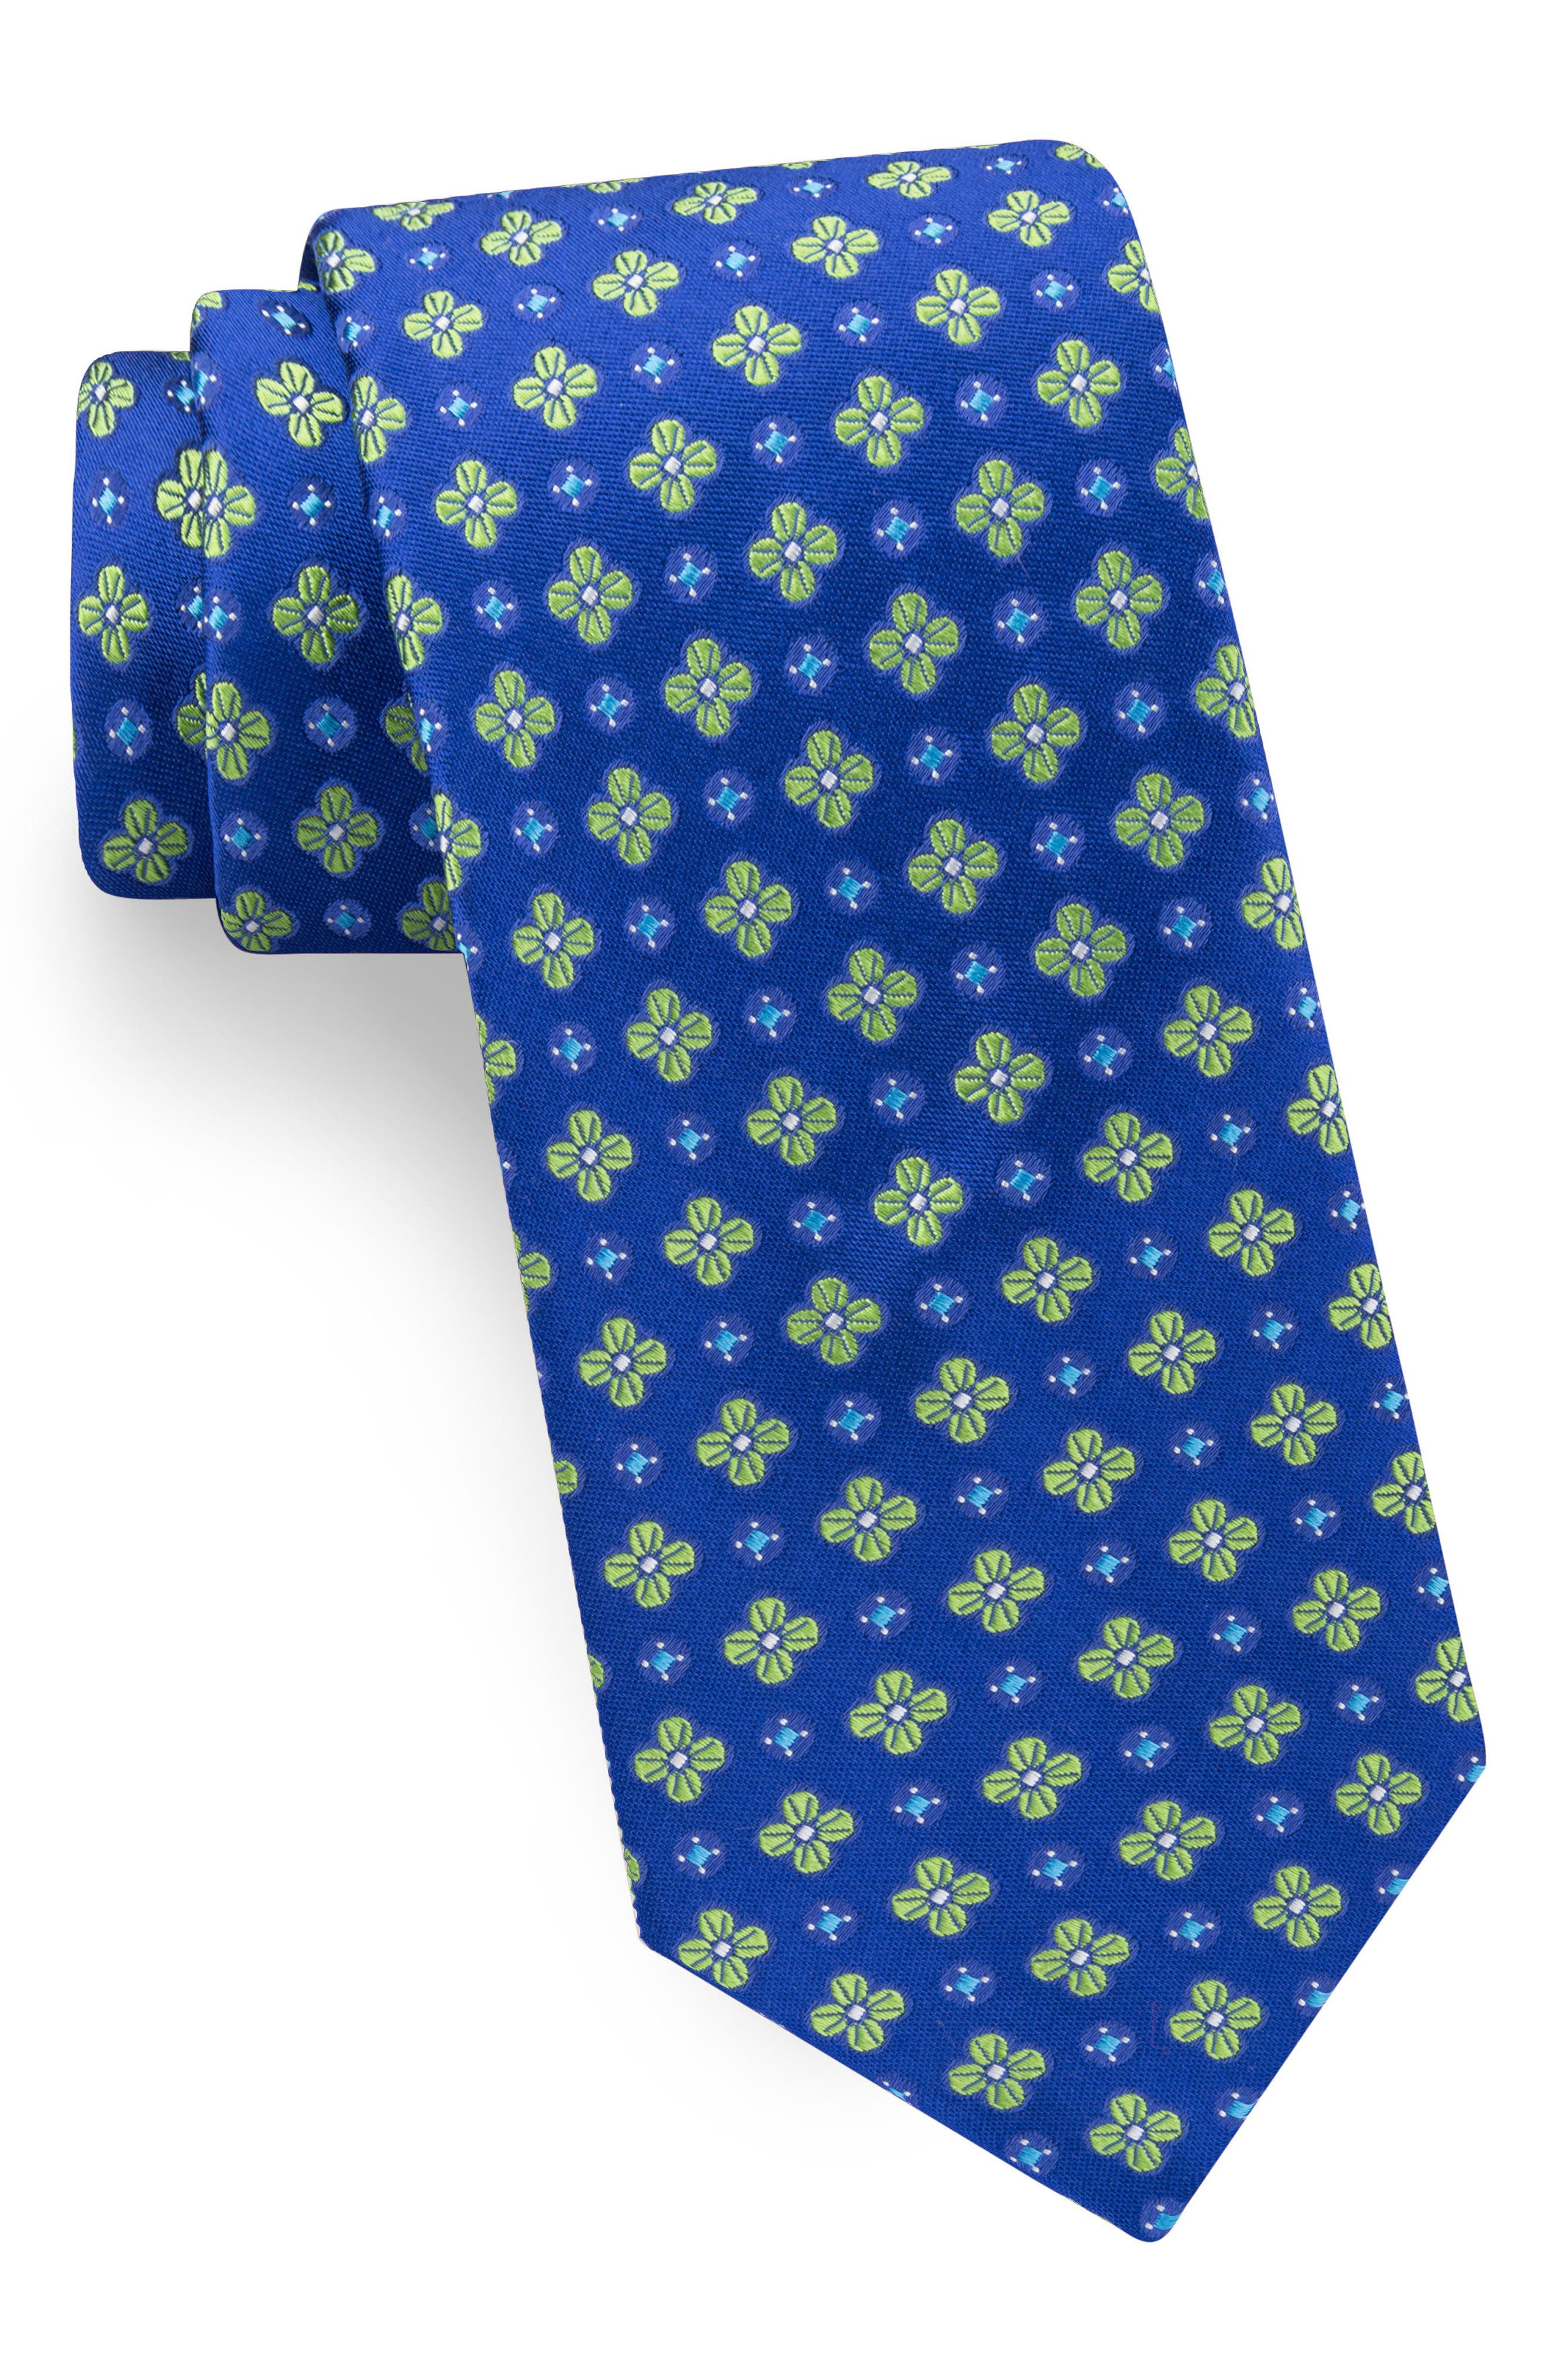 Lansbury Floral Silk Tie,                             Main thumbnail 1, color,                             Royal Blue